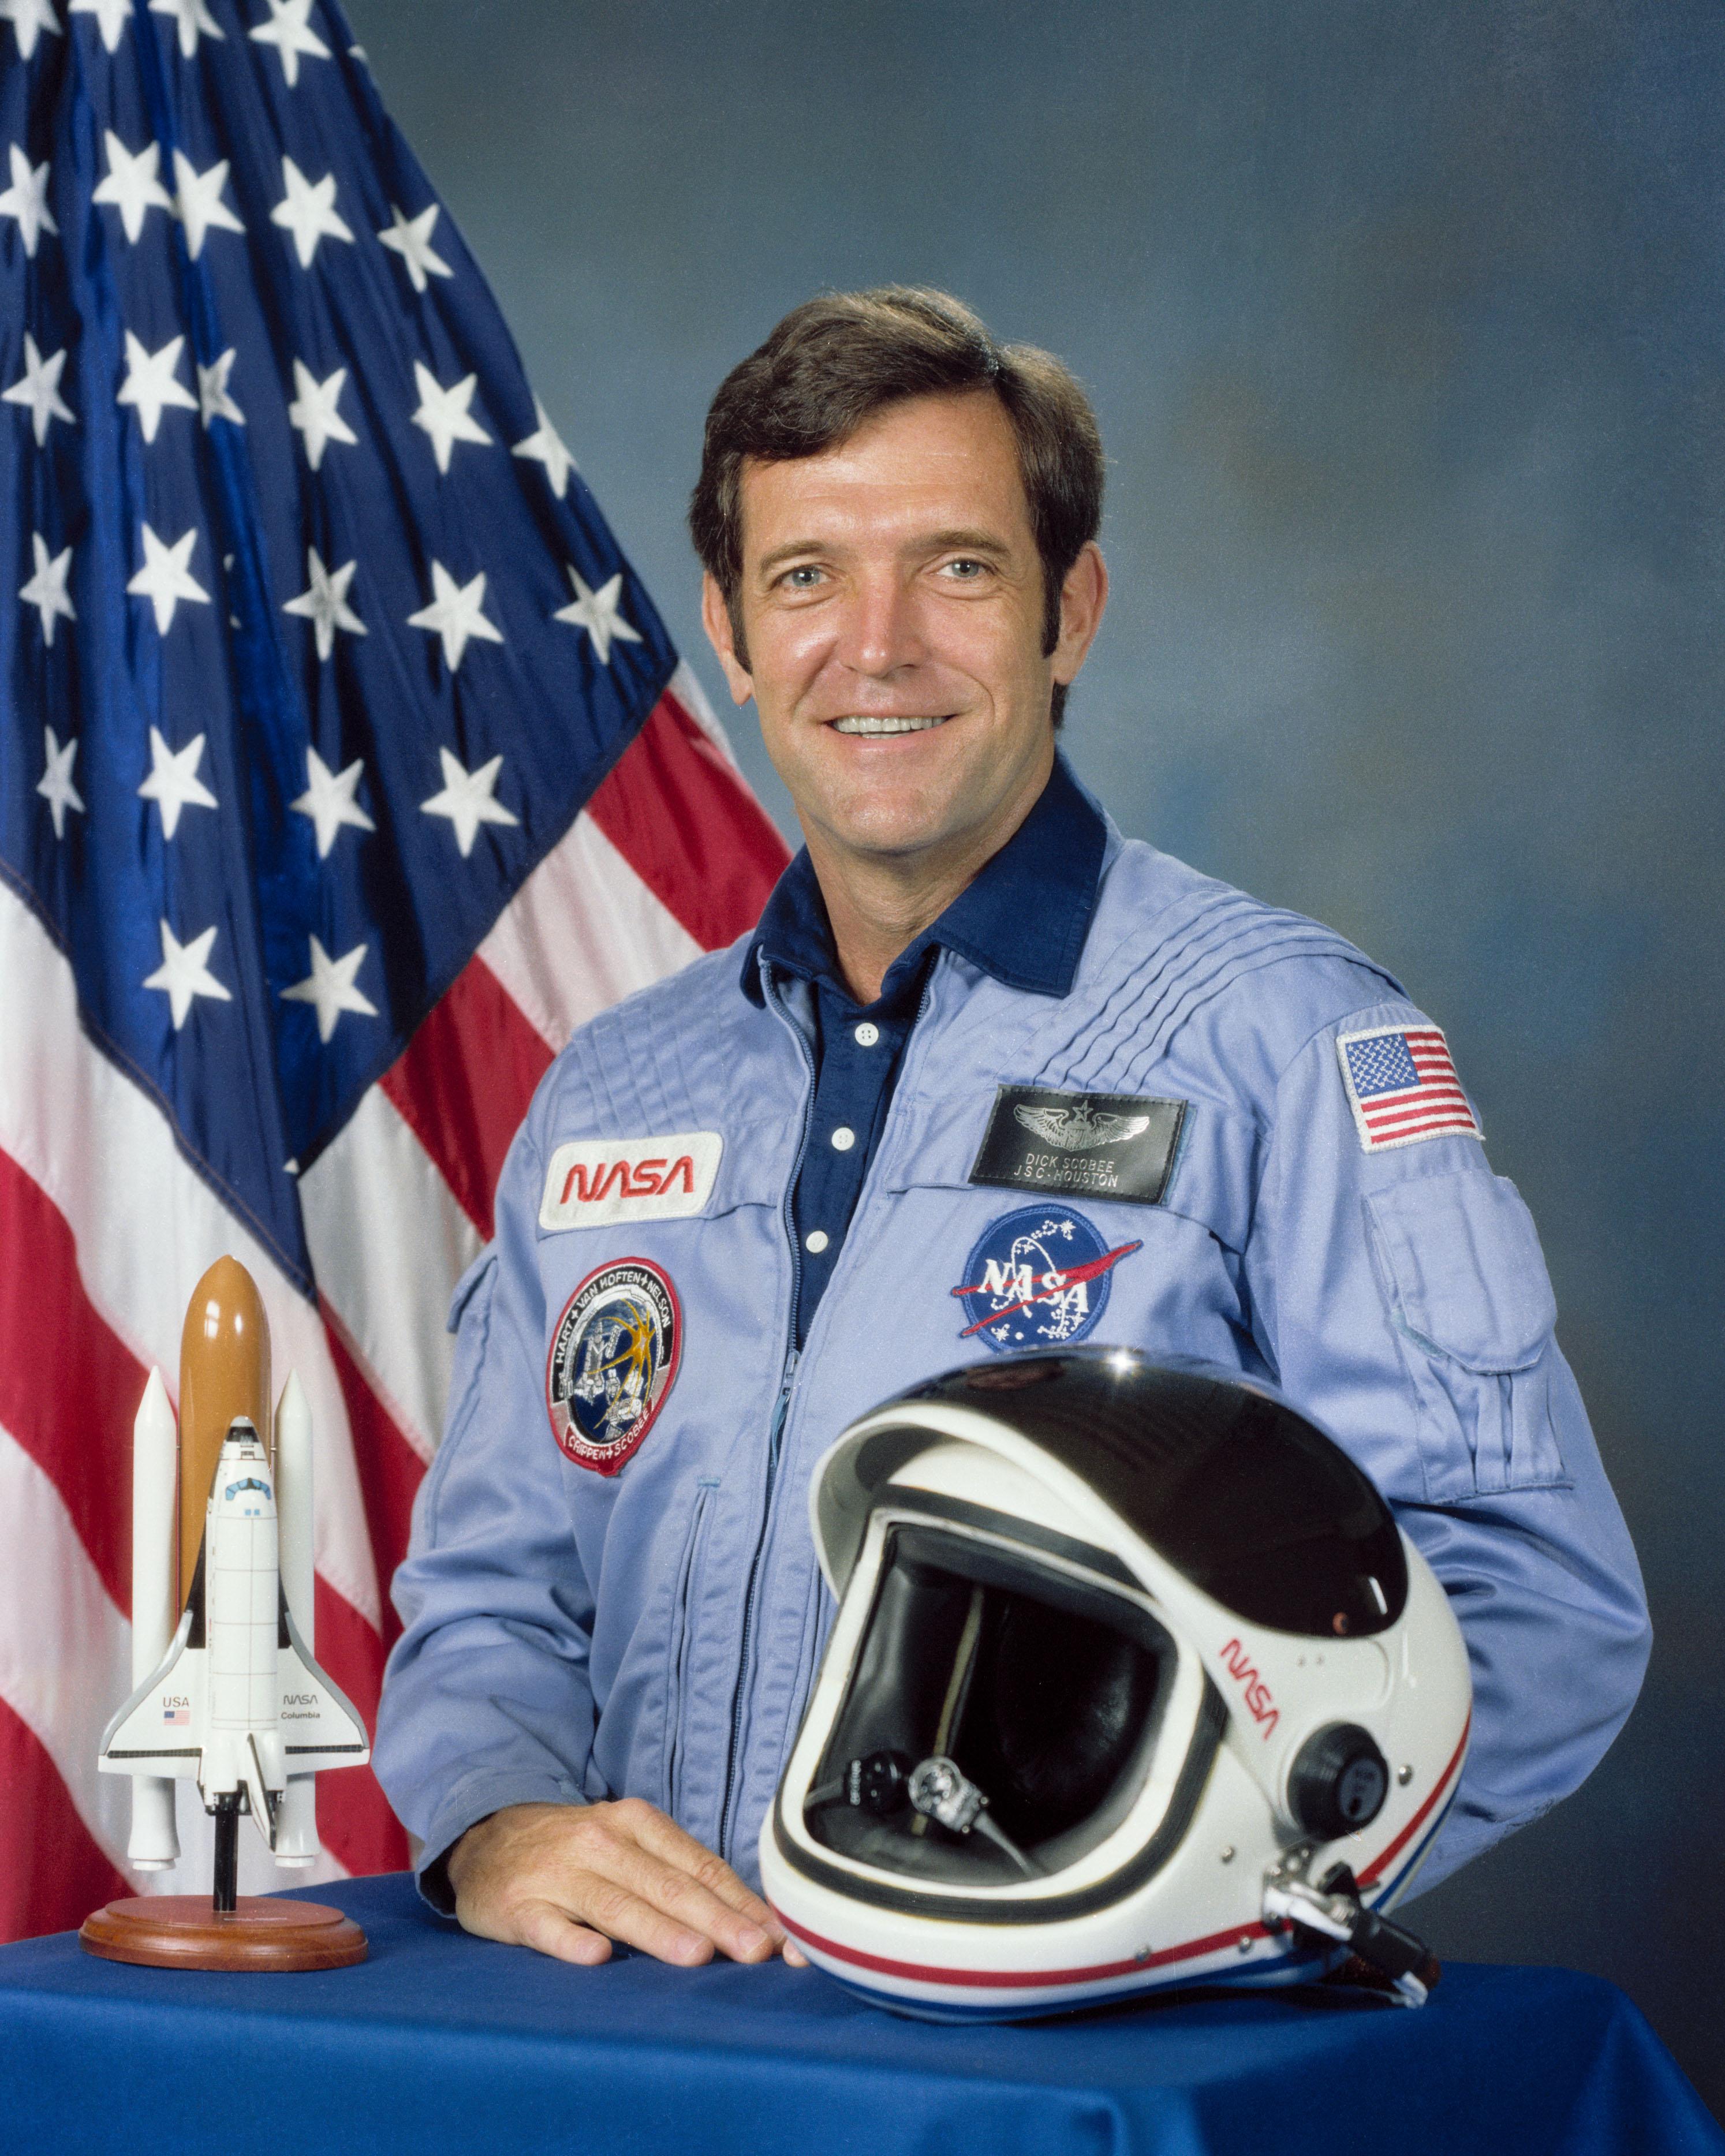 image of Dick Scobee